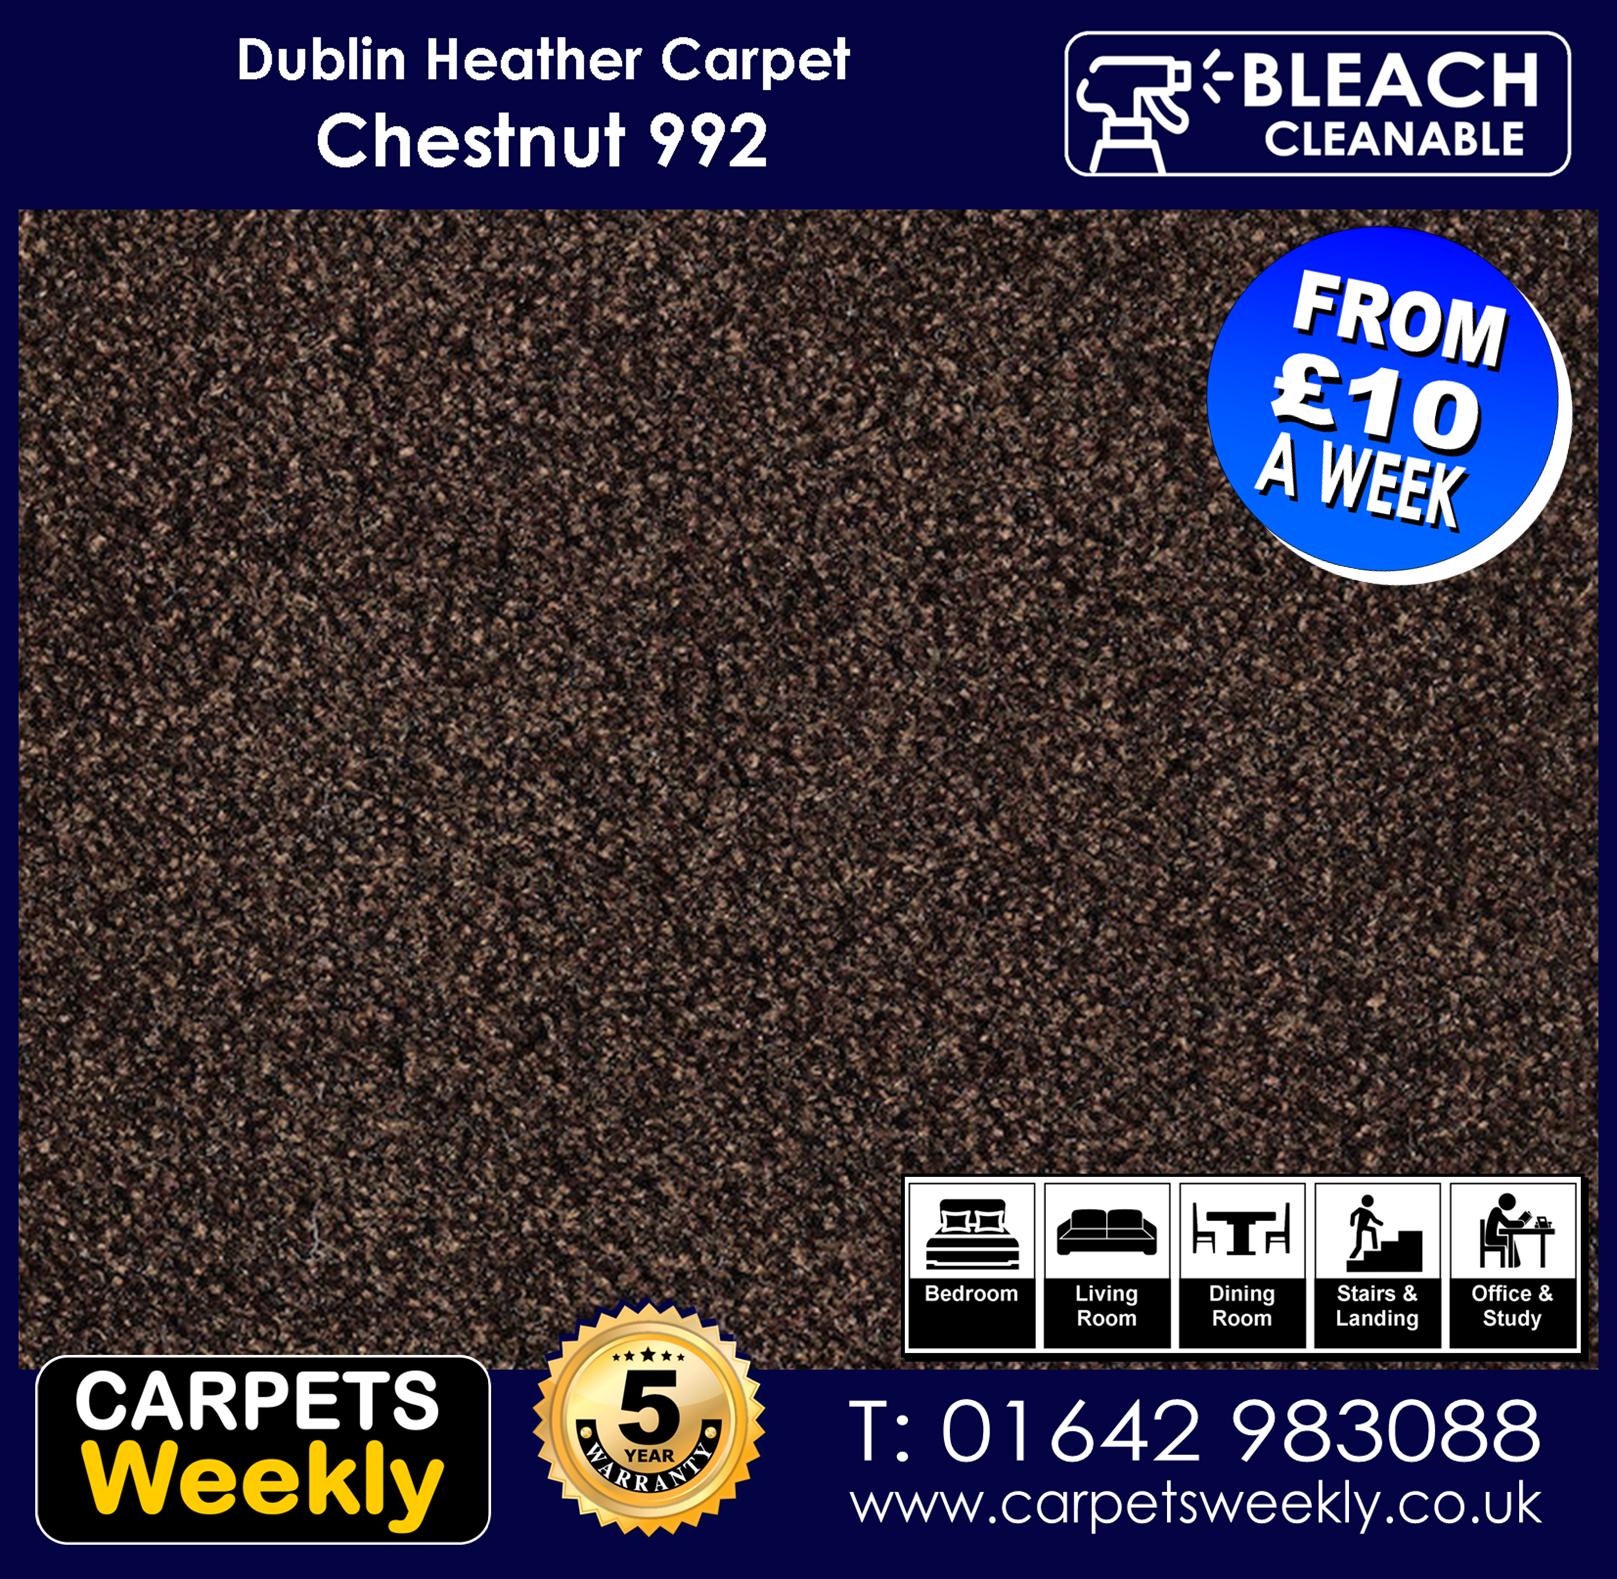 Carpets Weekly Dublin Heather Dublin Chestnut - 992 mid range carpet